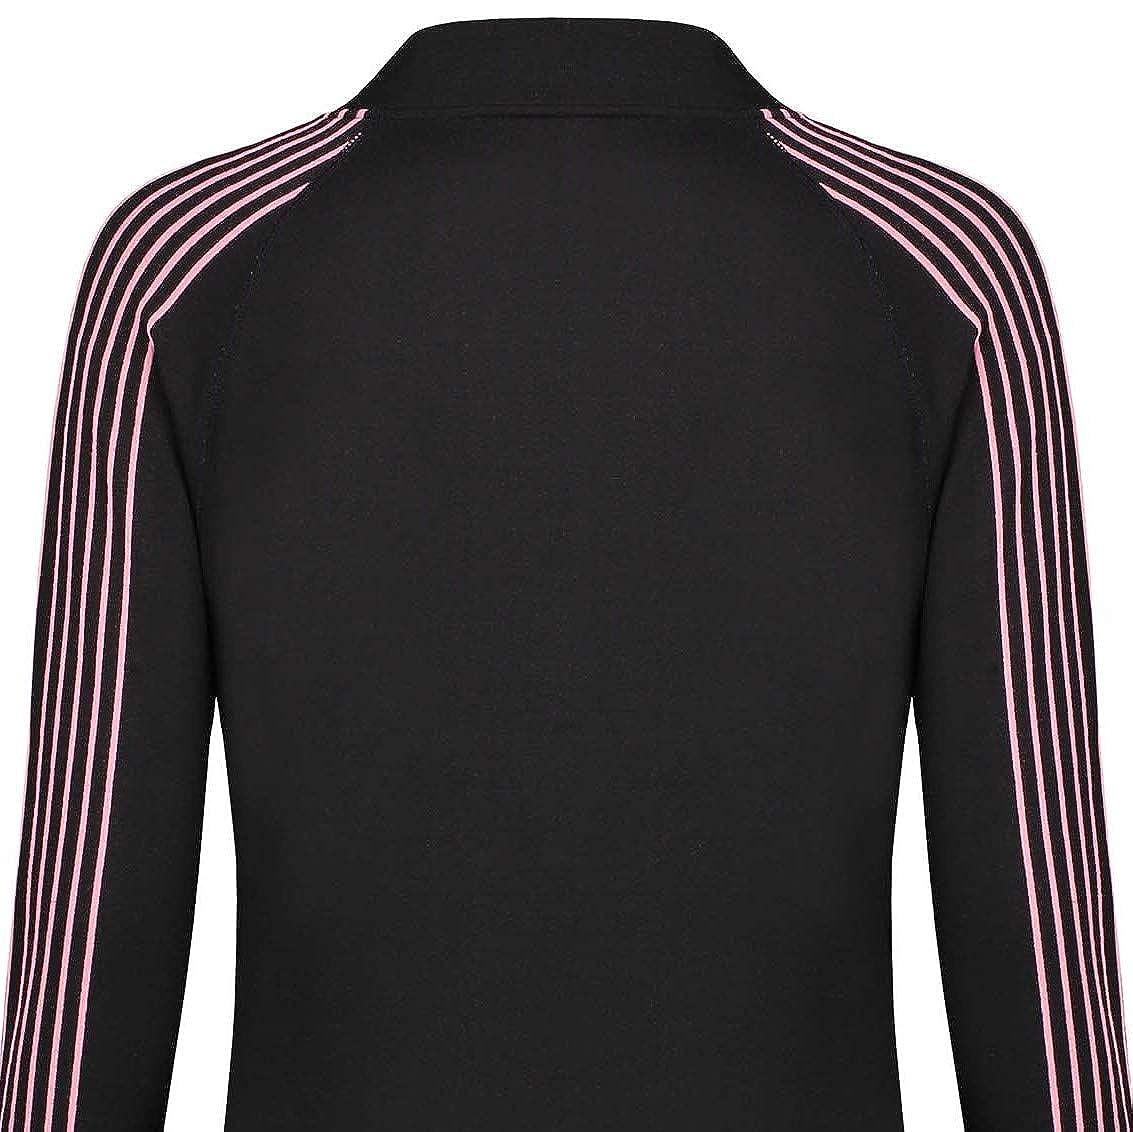 Pr/énatal Schwangere Umstandskleidung Sportweste Langarmshirt Schwarz